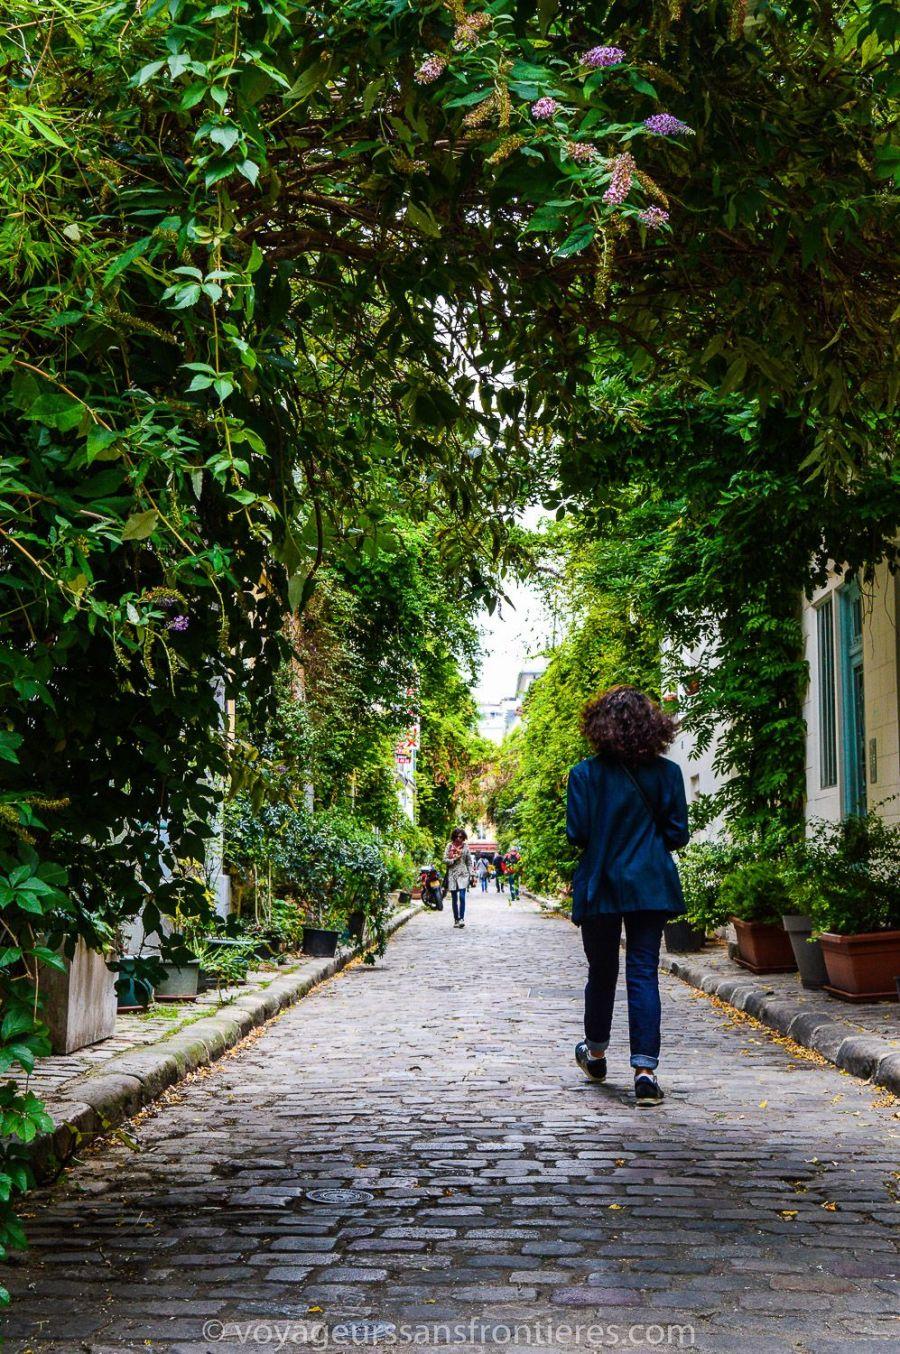 La rue des Thermopyles - Paris, France